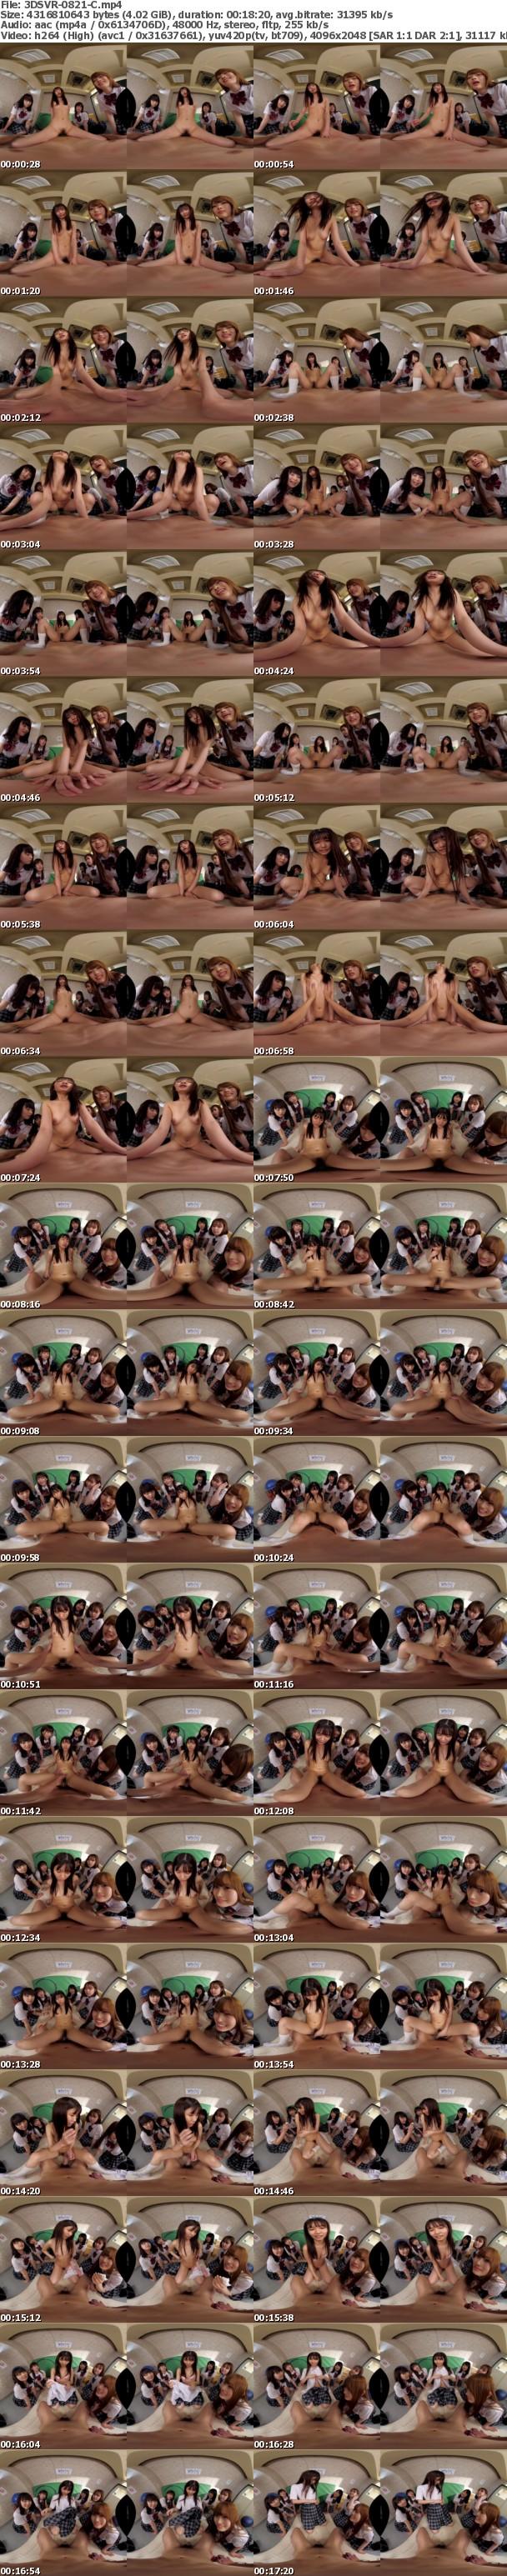 (VR) 3DSVR-0821 女子○生たちに囲まれながら彼女とエッチ!見られていることに性的興奮を感じるCFNMセックス